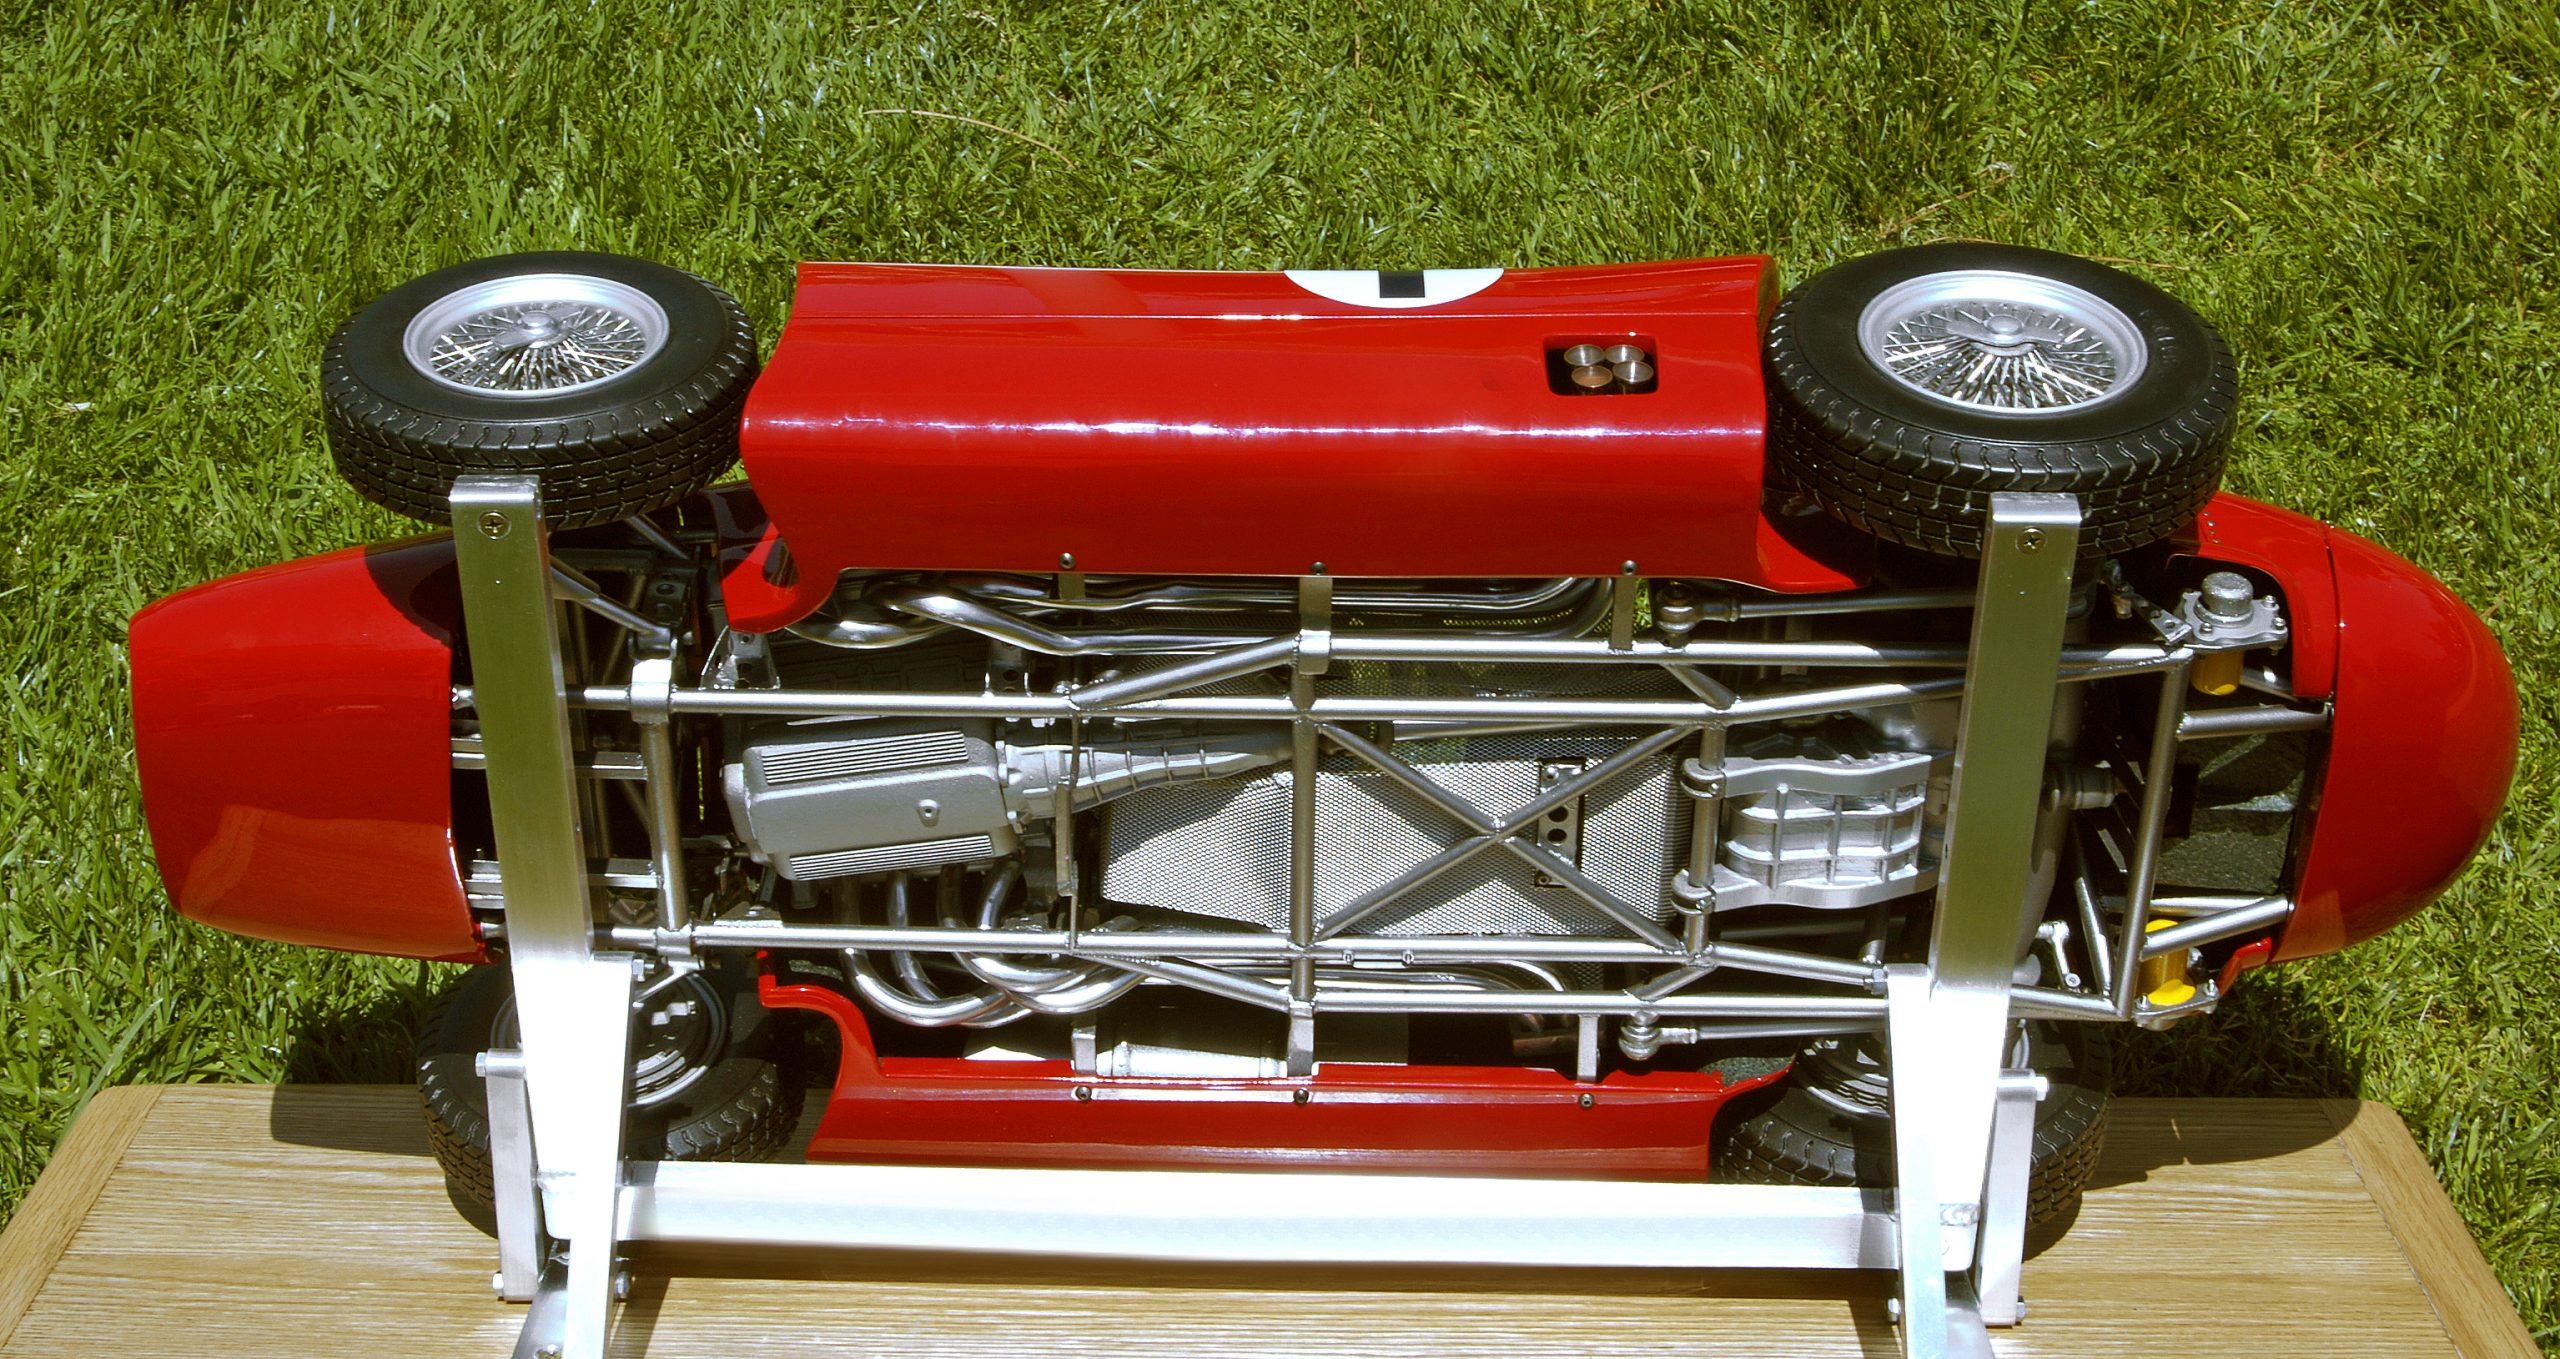 ferrari scale model underside chassis